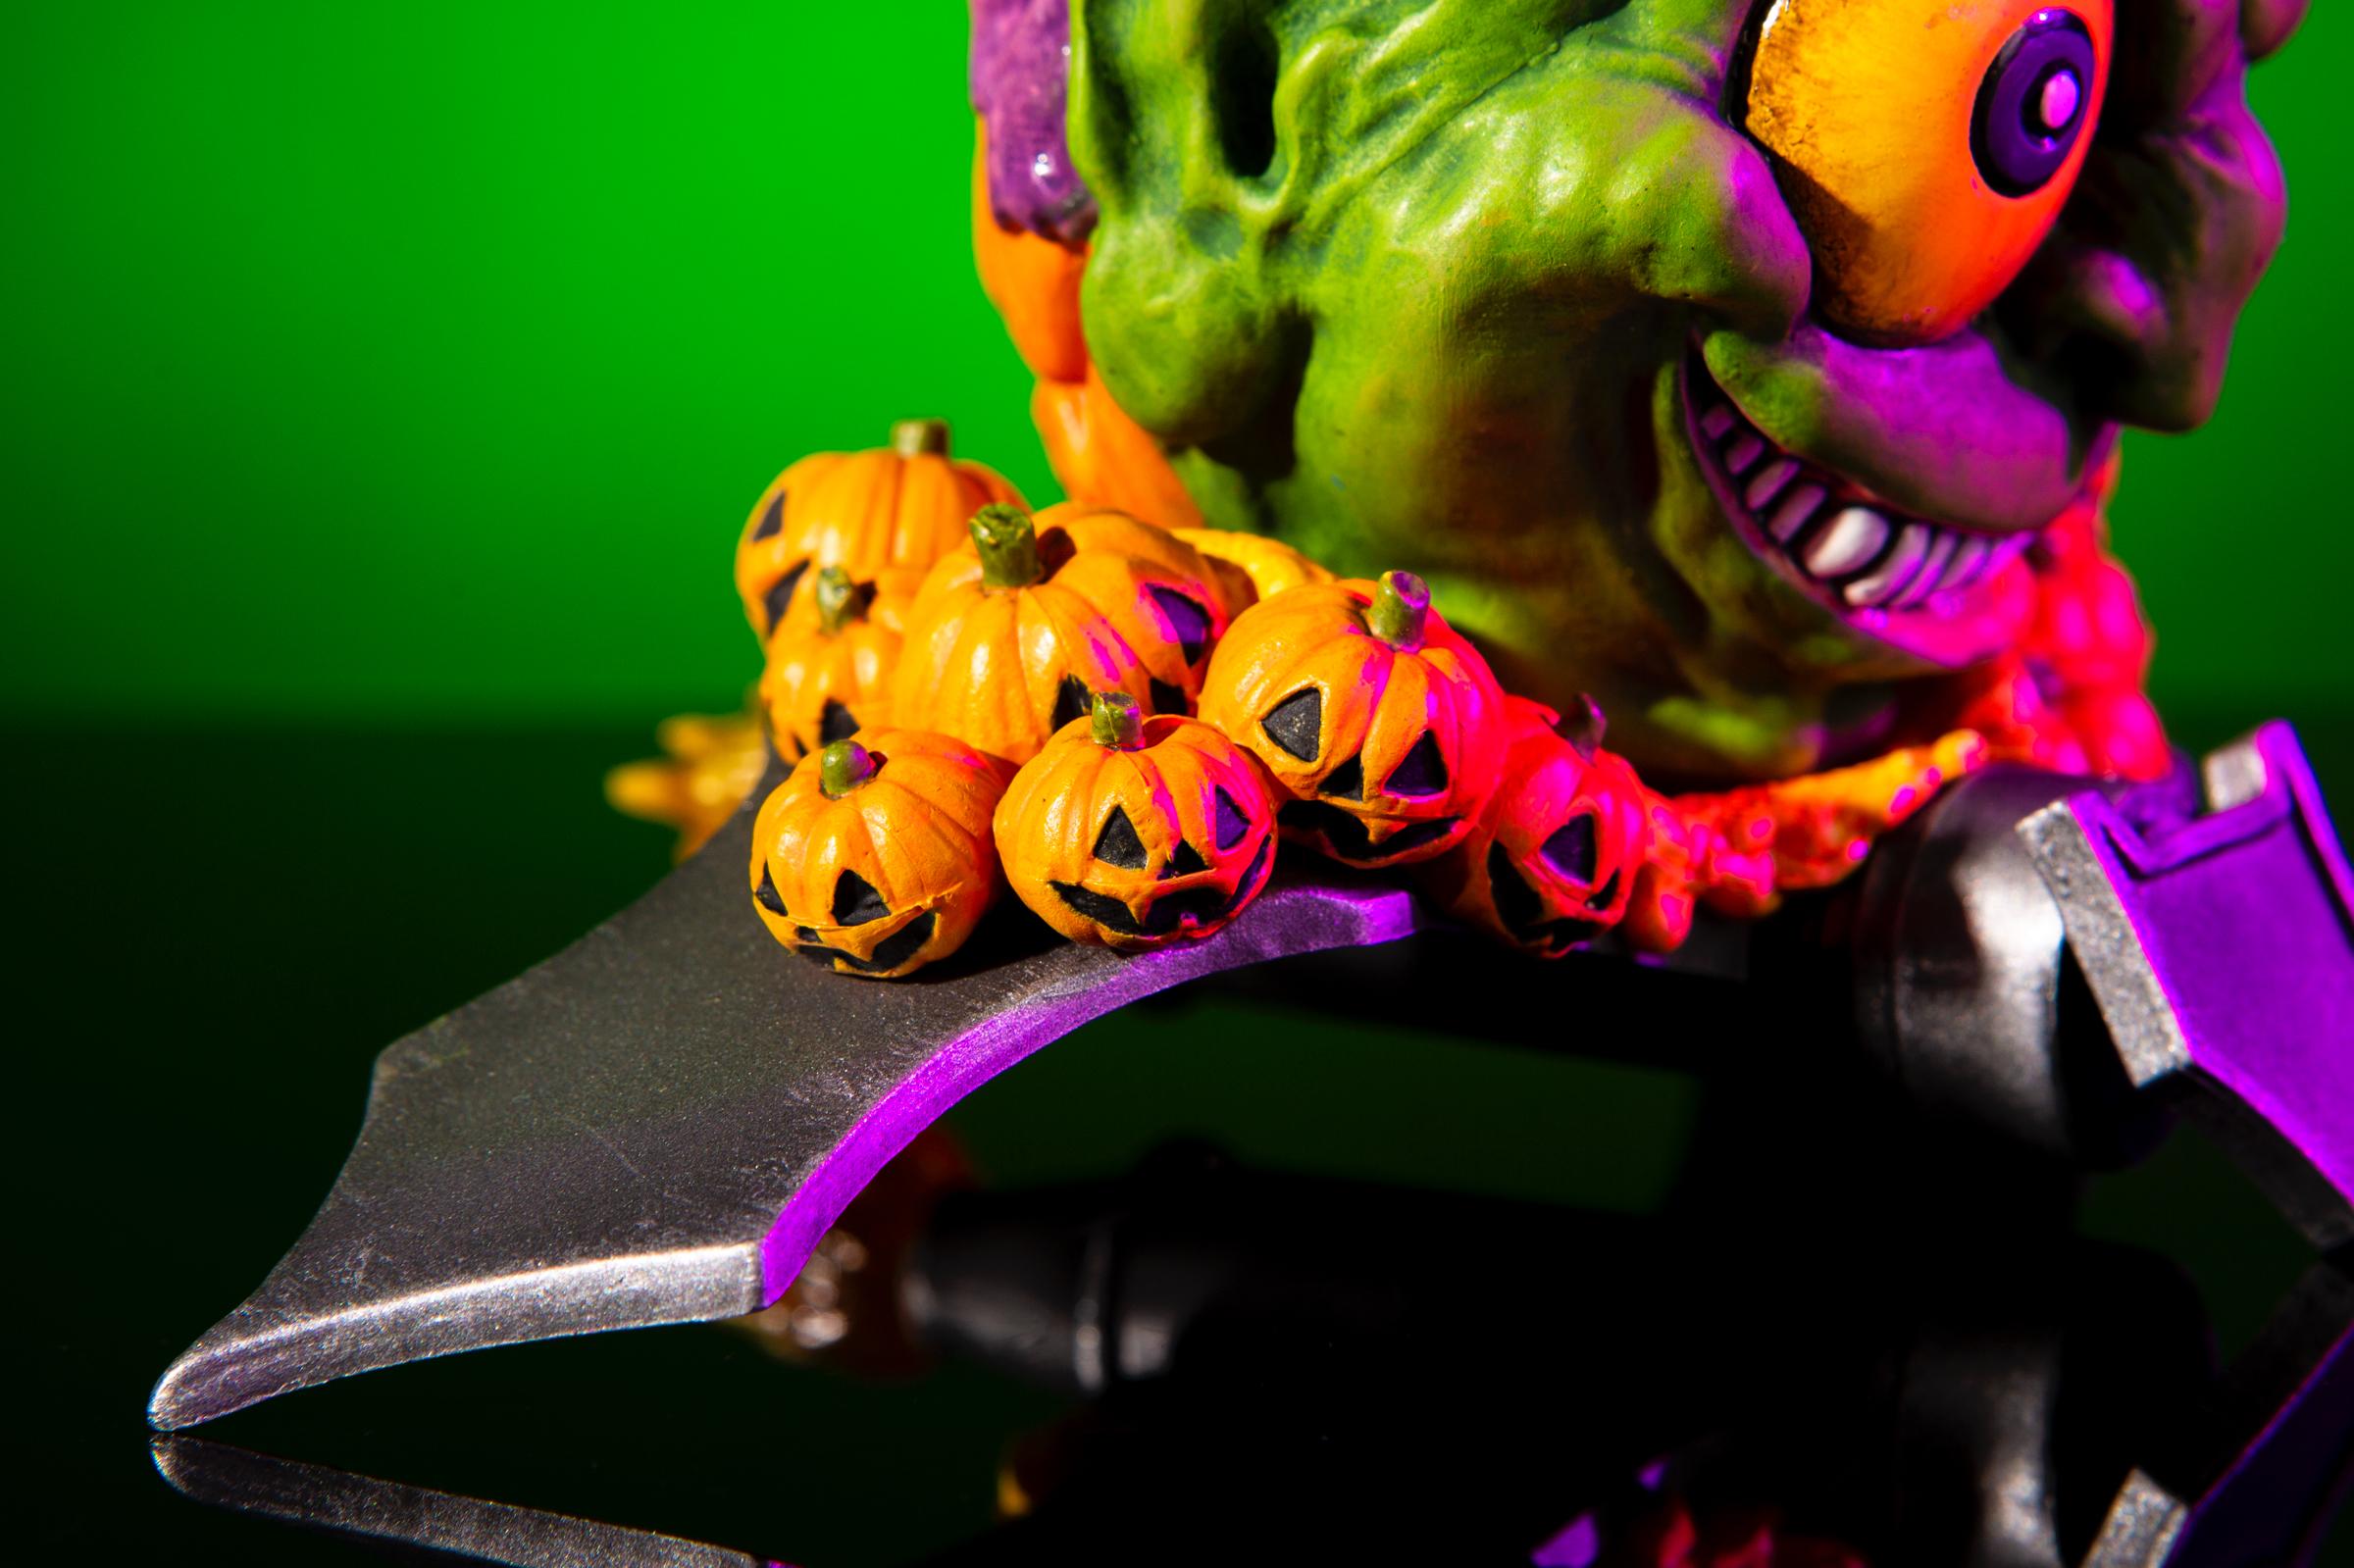 Green Goblin Mondoid Vinyl Figure